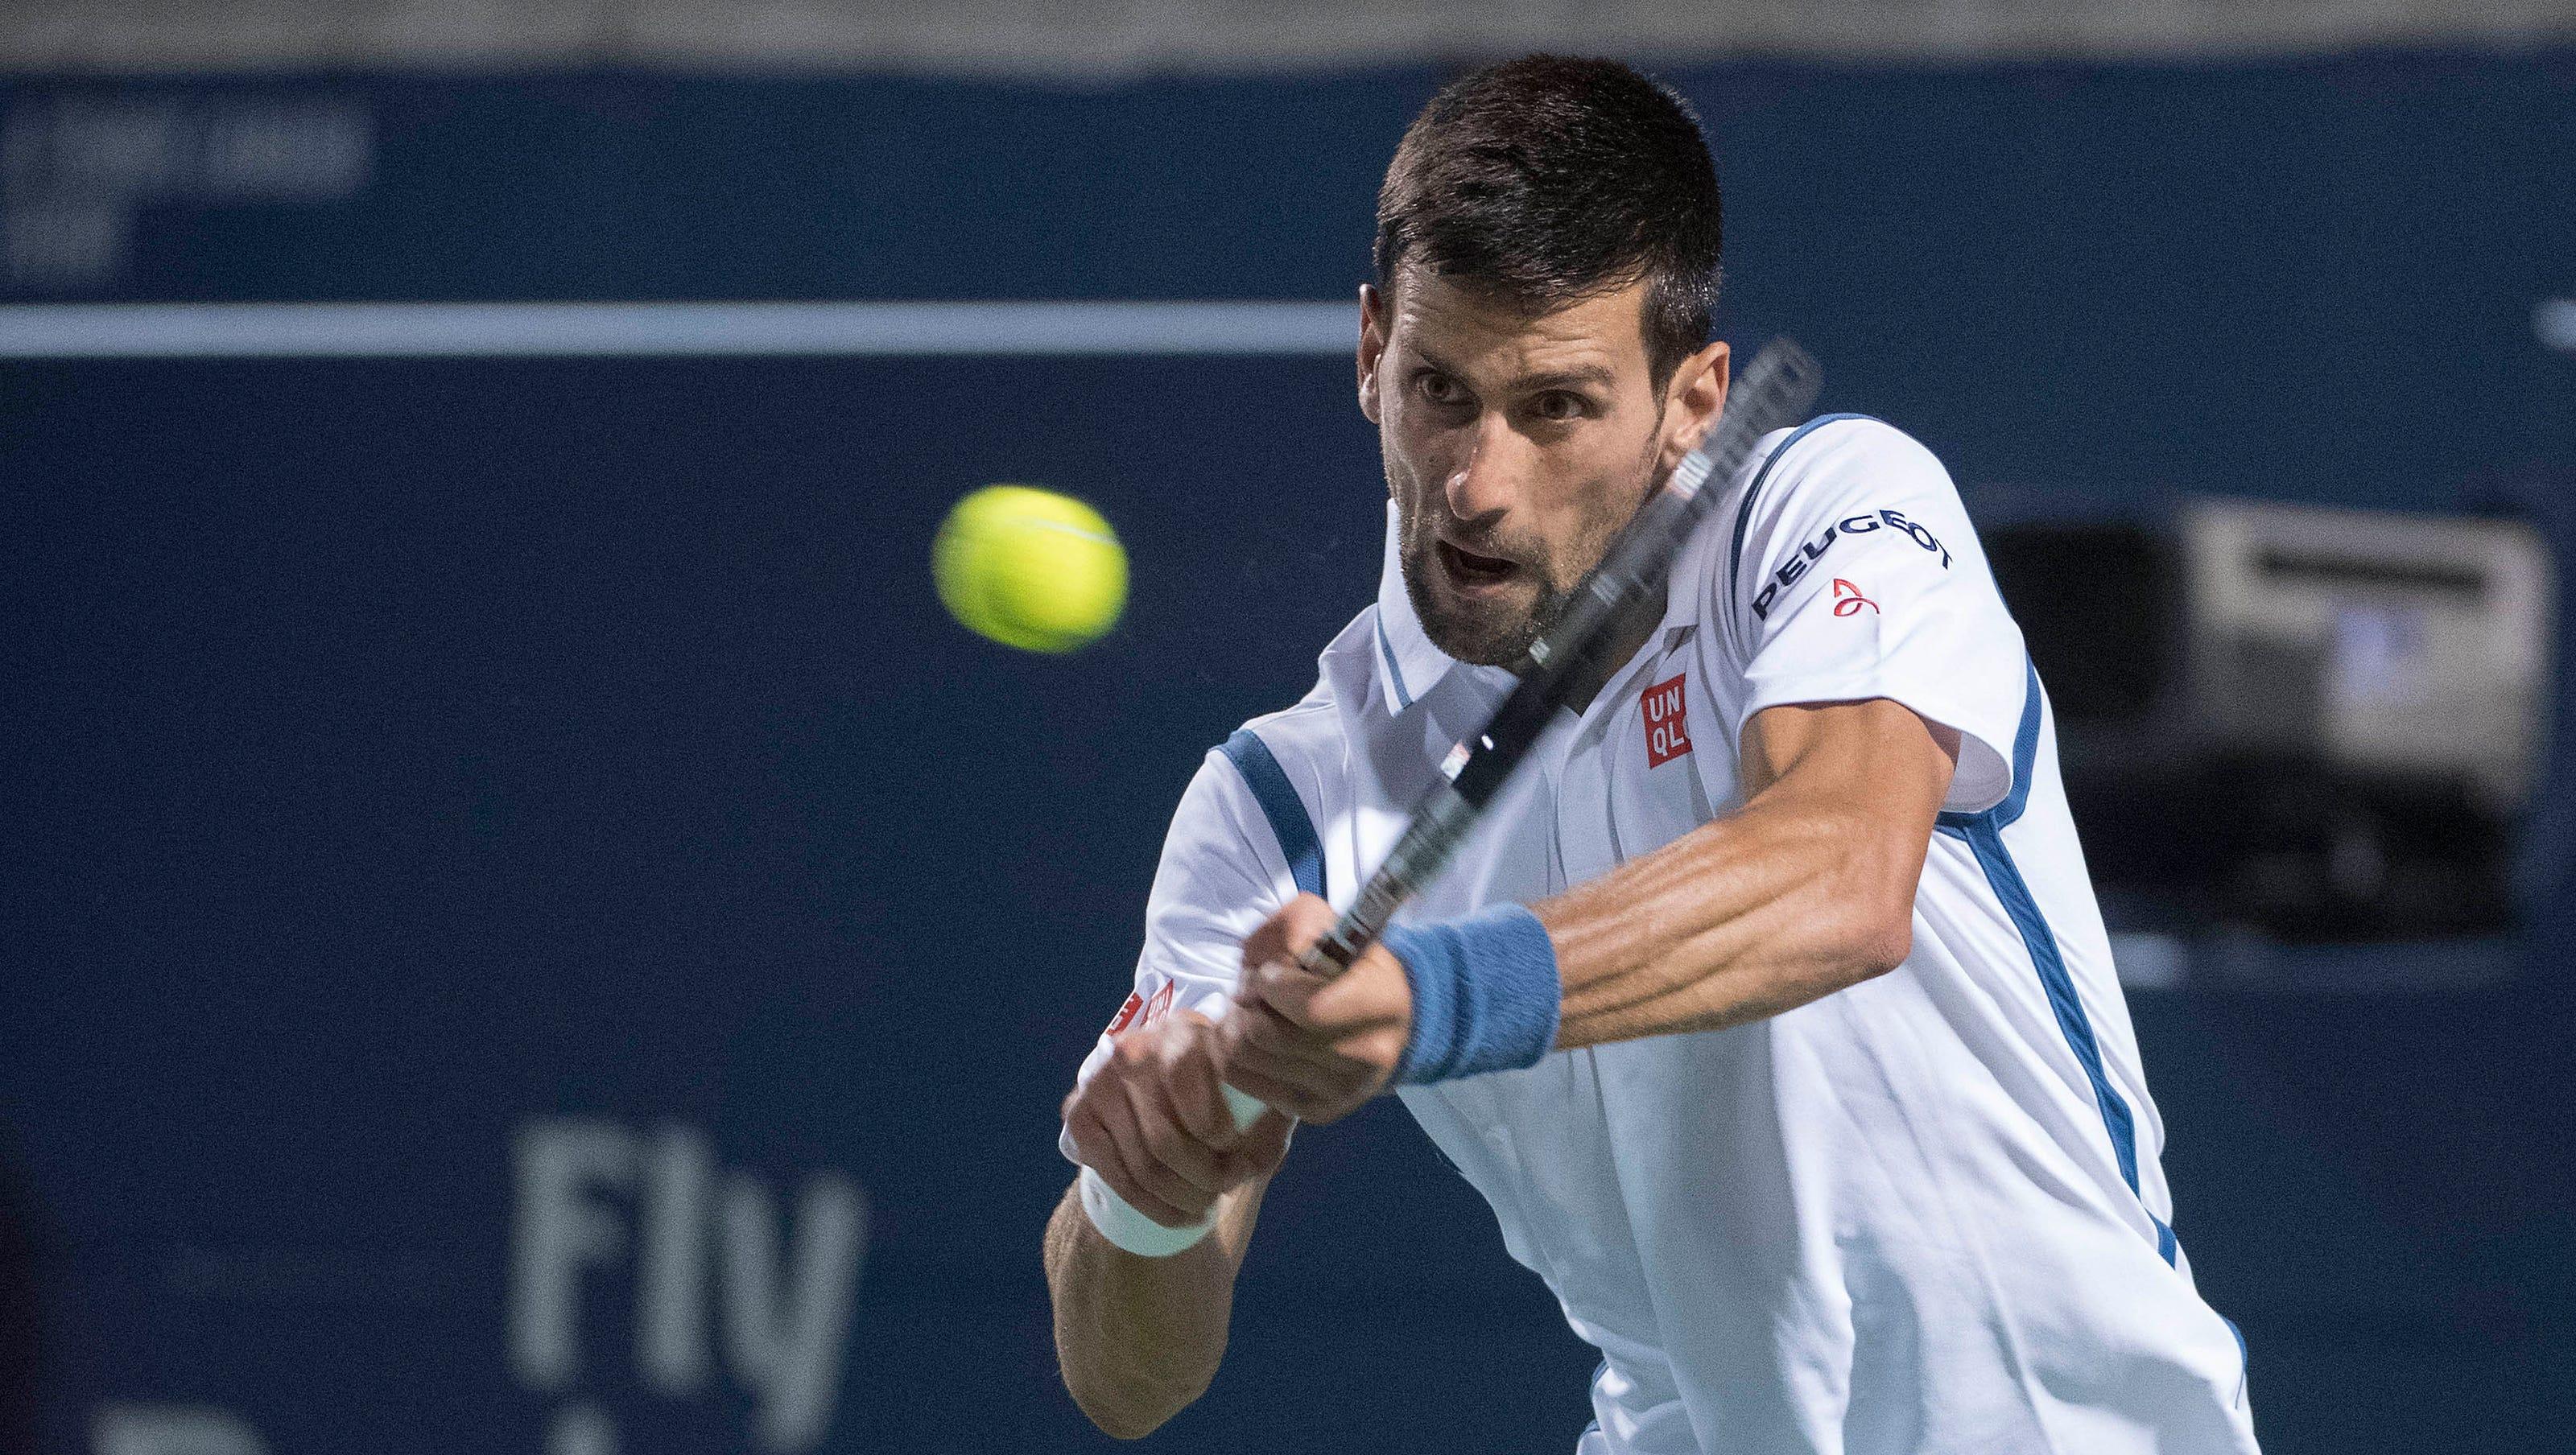 Top Ranked Novak Djokovic Beats Gael Monfils To Reach Rogers Cup Final